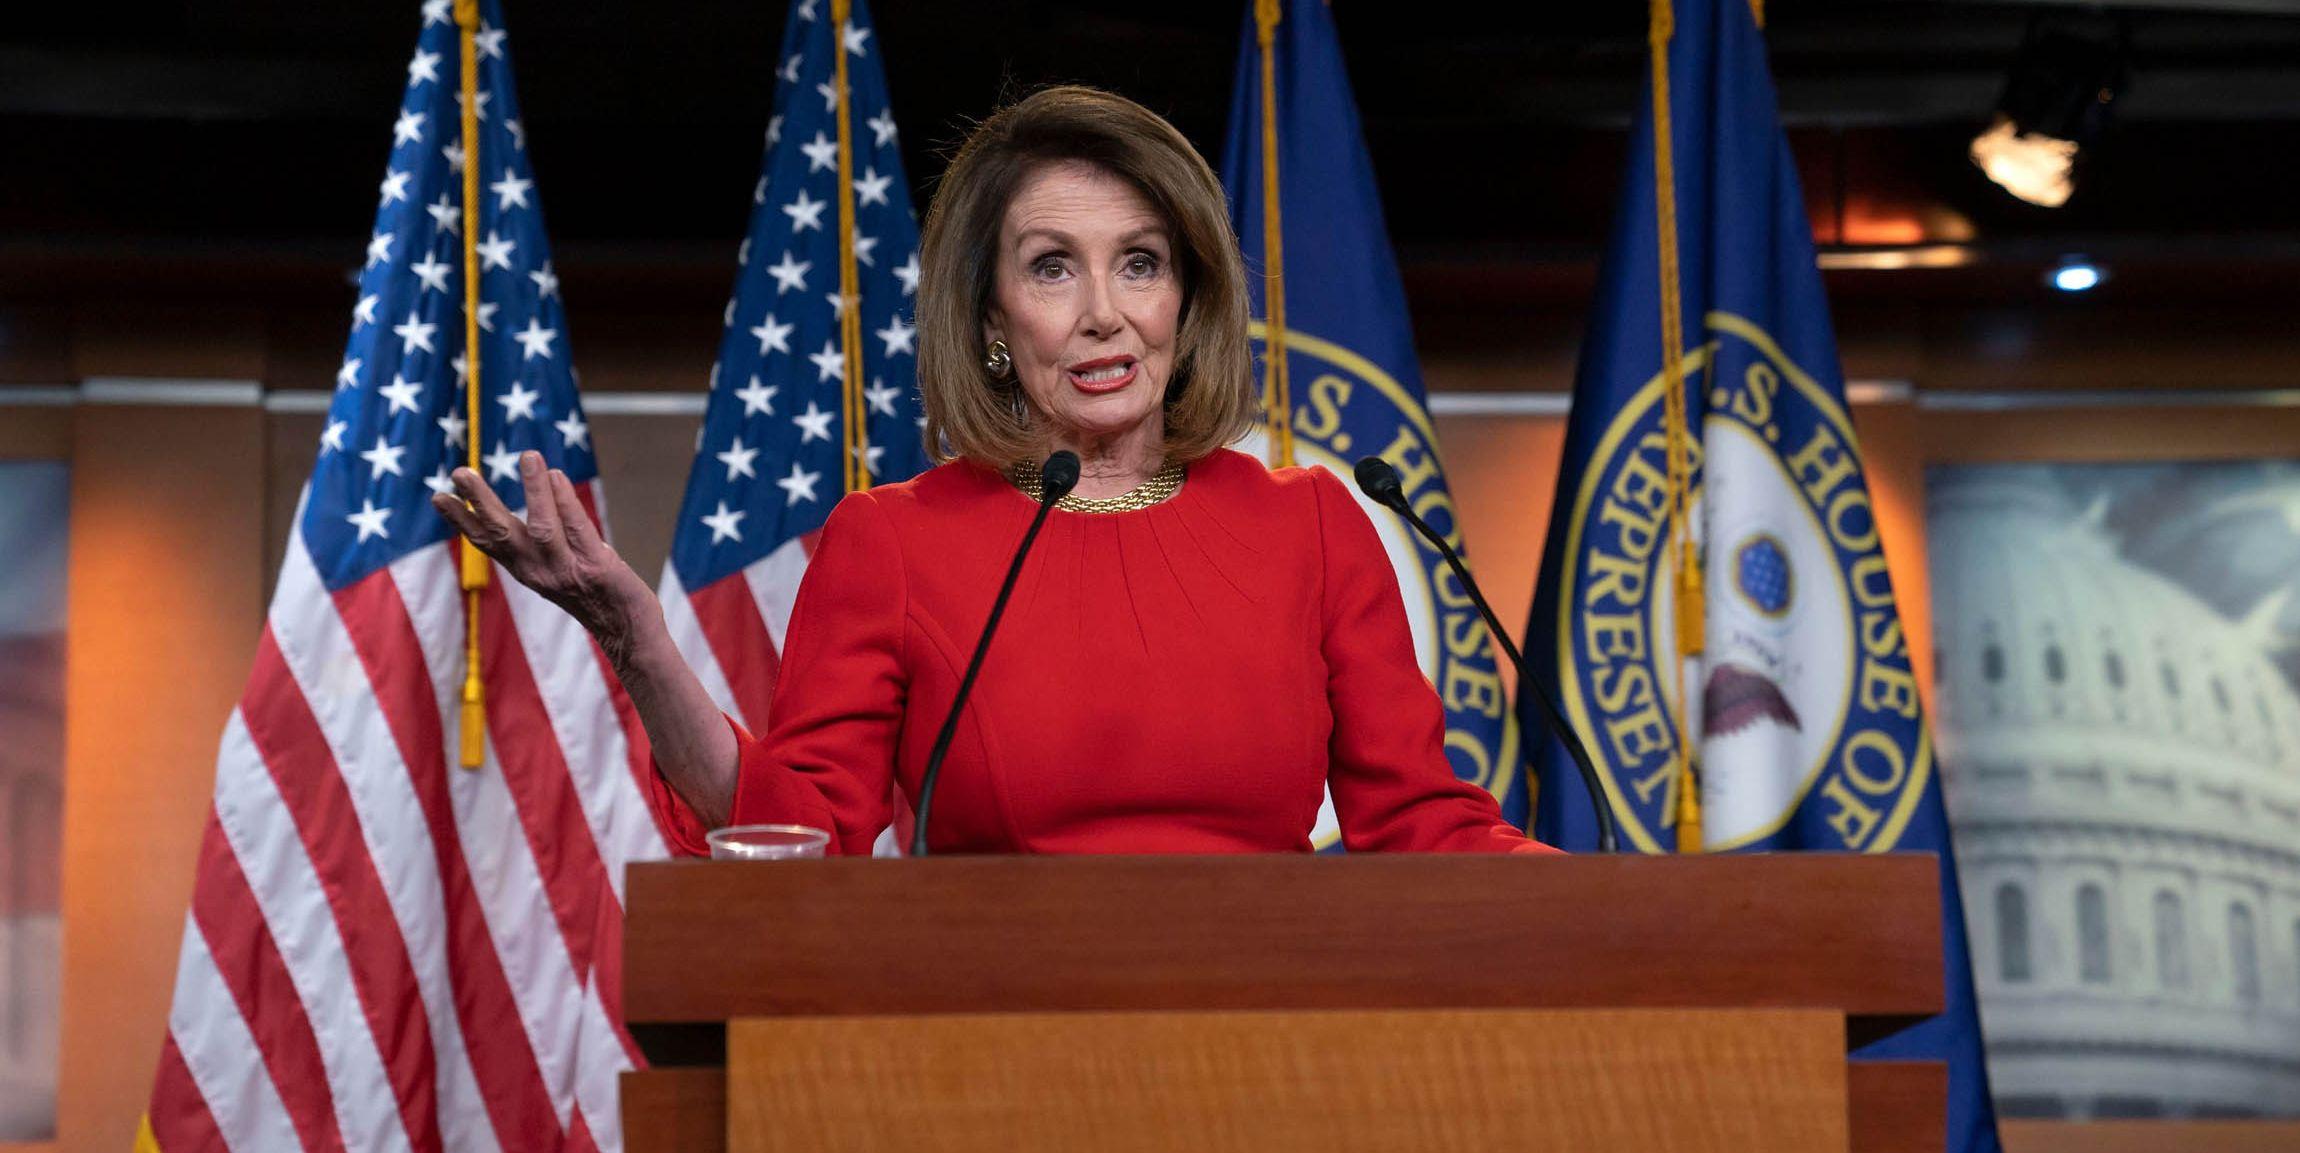 Congress Russia Probe, Washington, USA - 04 Apr 2019